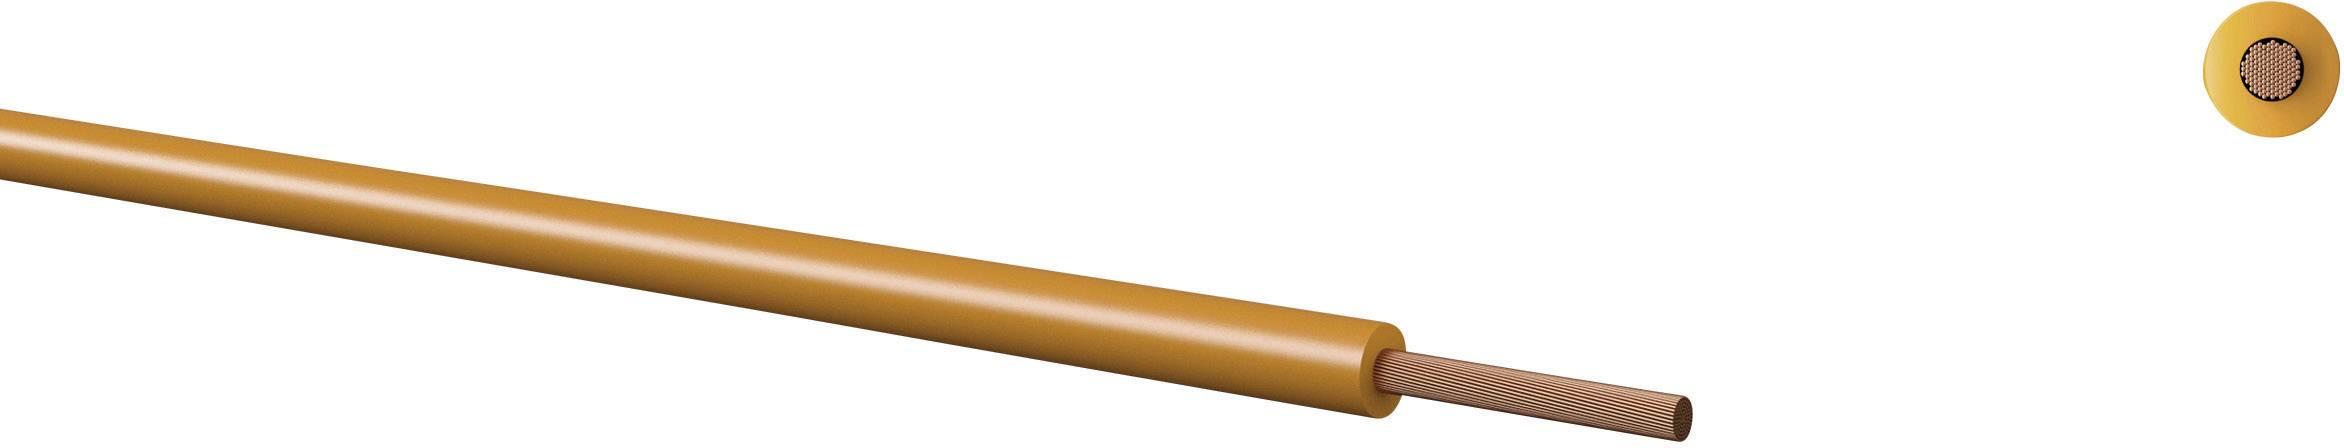 Licna Kabeltronik LiFY 160110007, 1x 1 mm², PVC, Ø 2,50 mm, 1 m, modrá